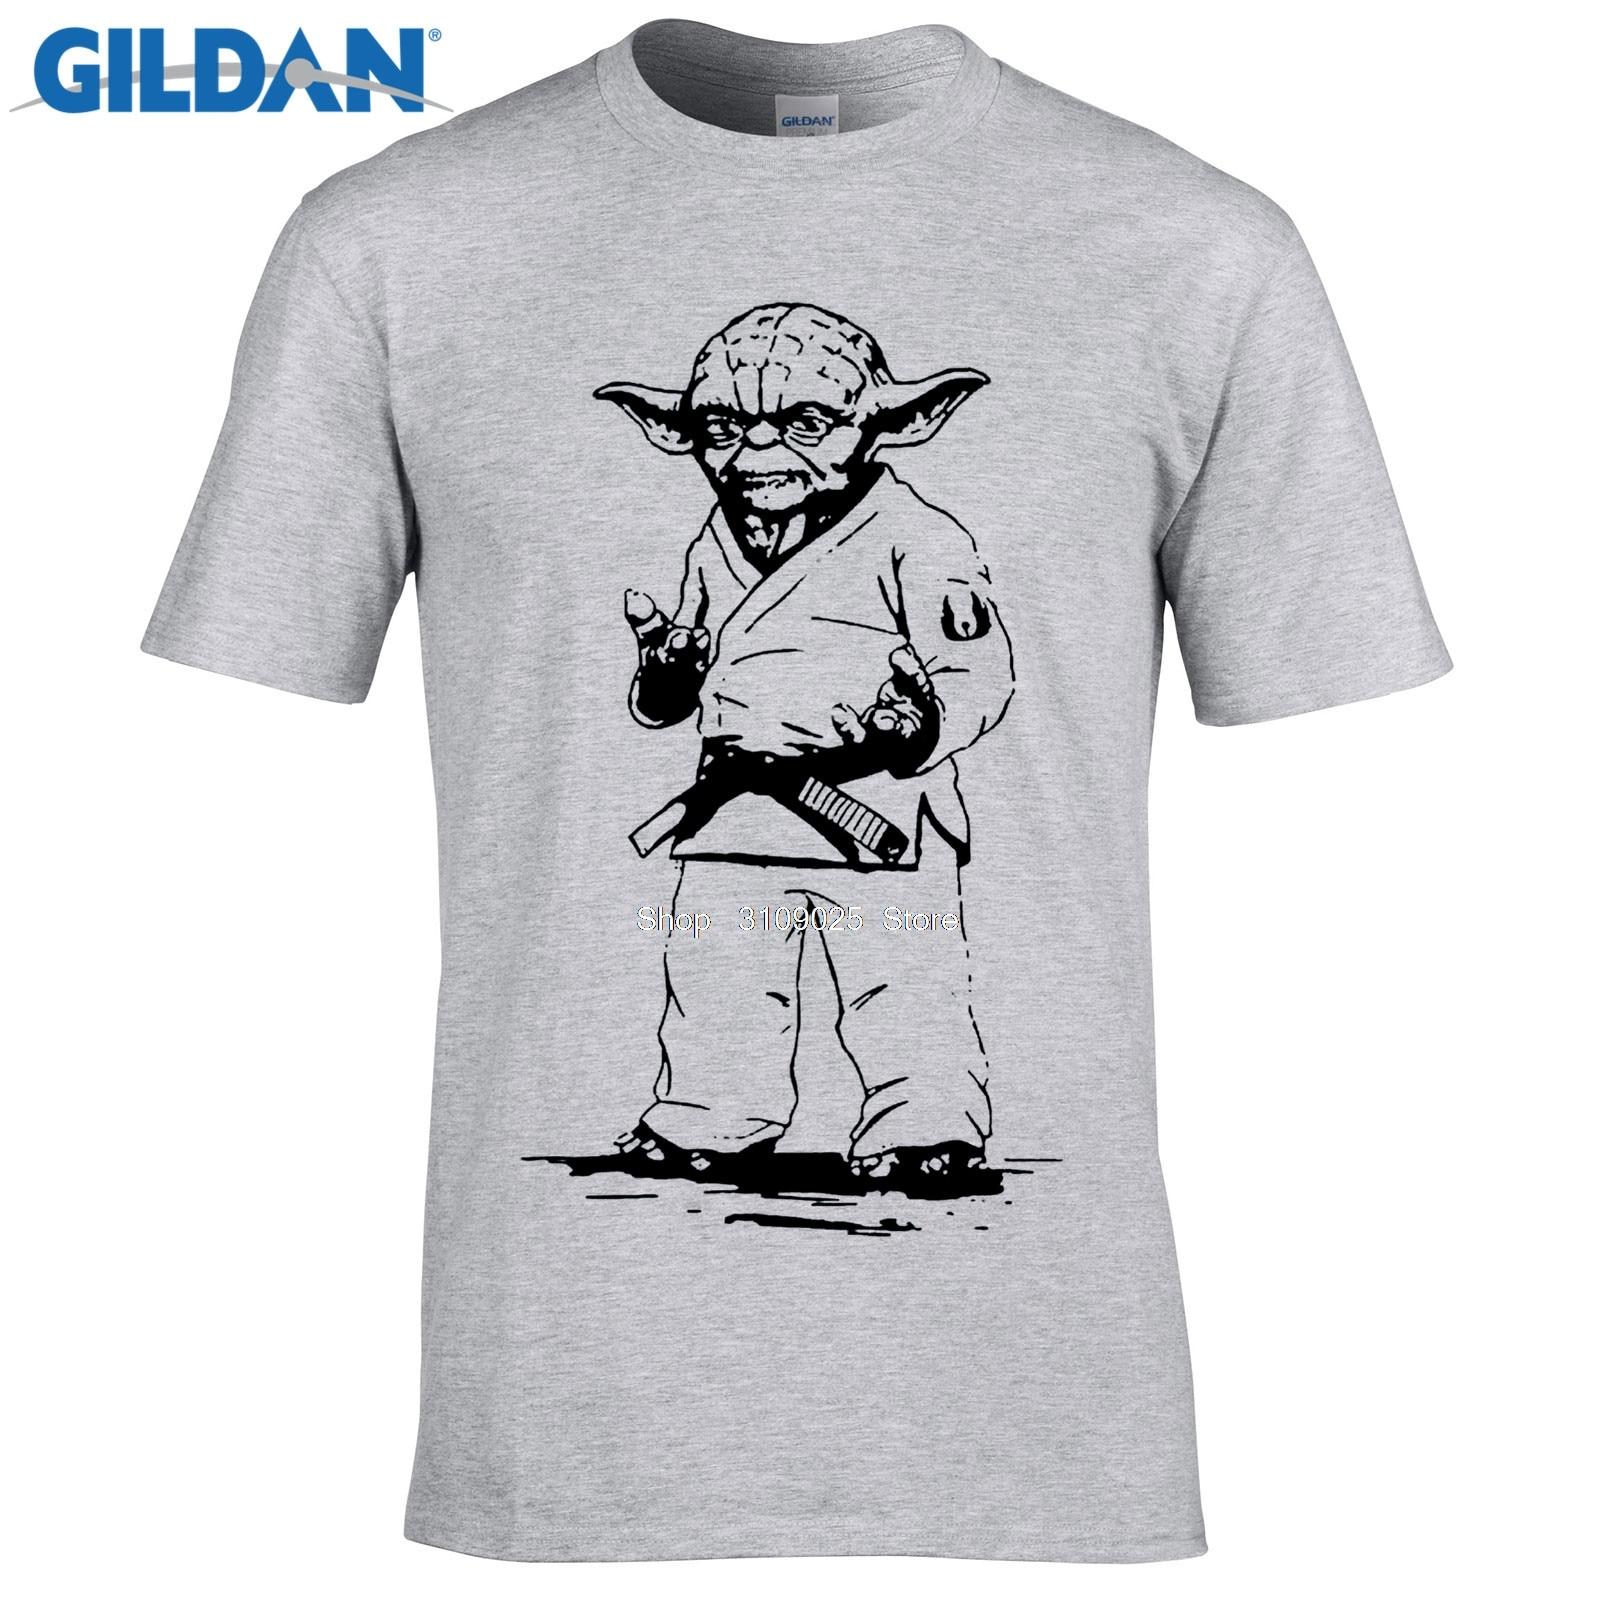 Gildan Designer T Shirt Star Wars Yoda Judo Jiu Jitsu T Shirt Top